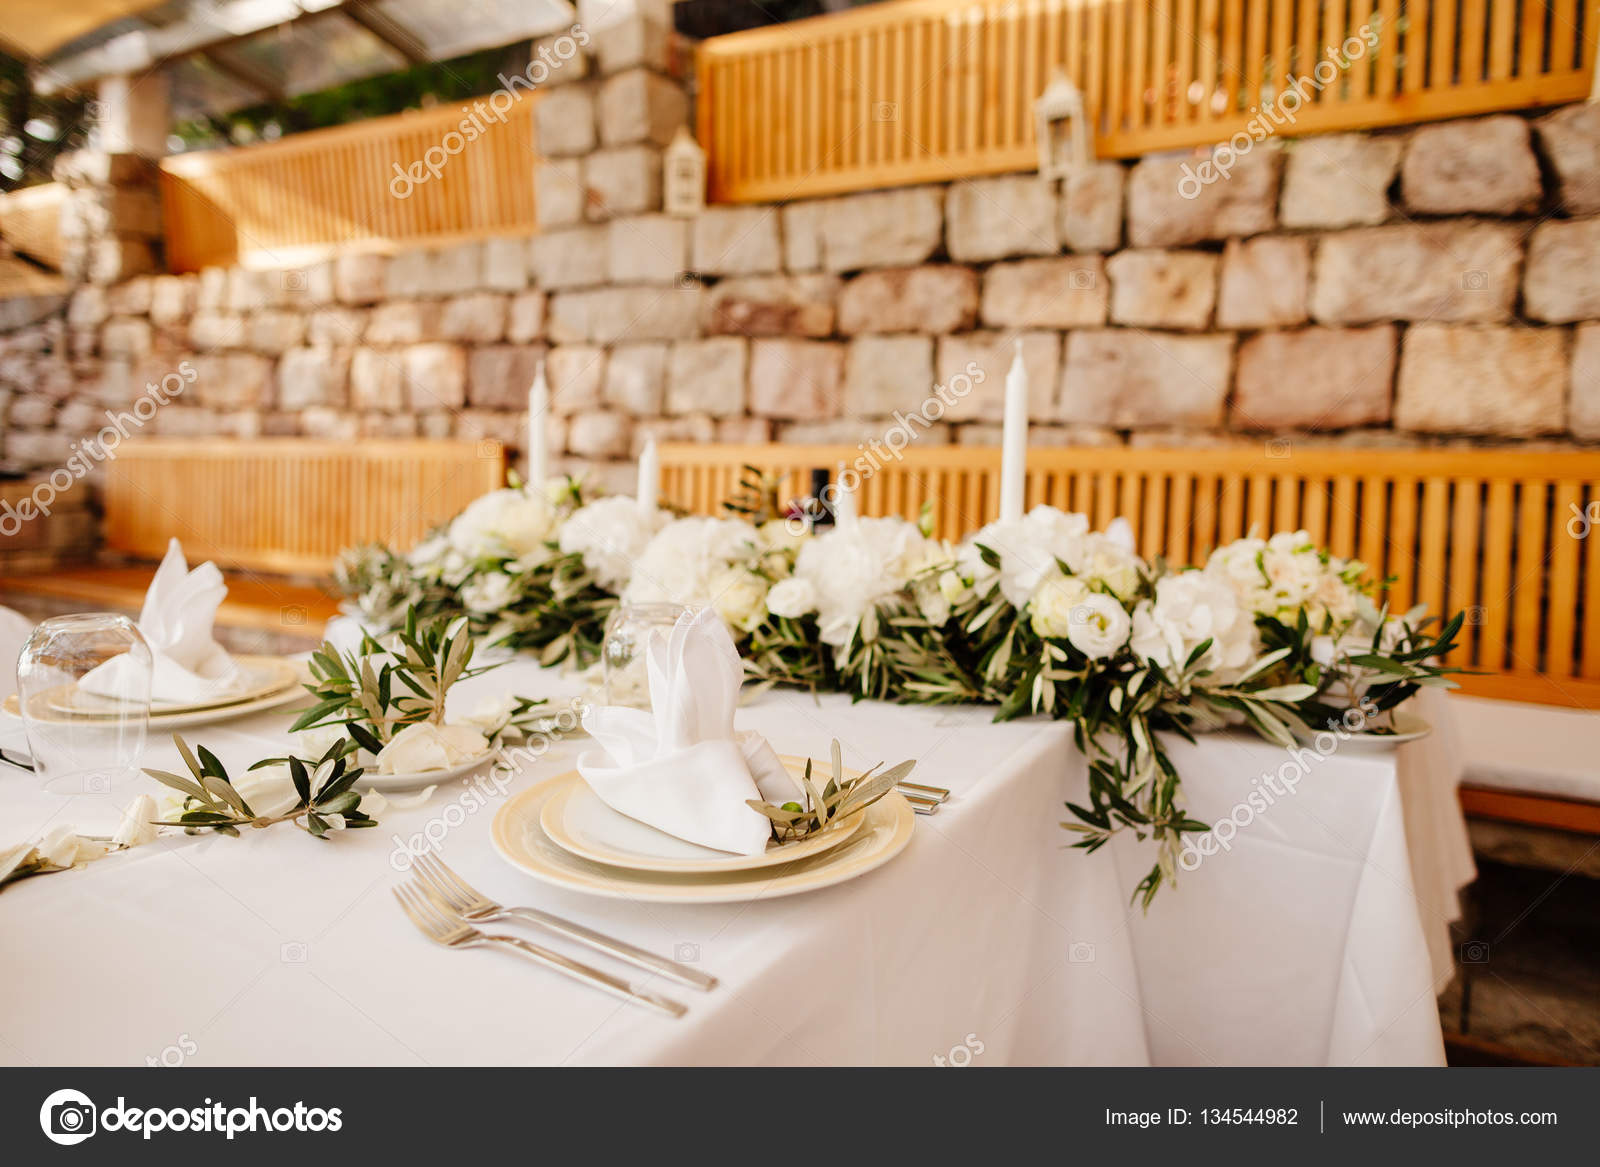 Bloem tafeldecoratie bruiloft stockfoto shevtsovy for Tafeldecoratie bruiloft